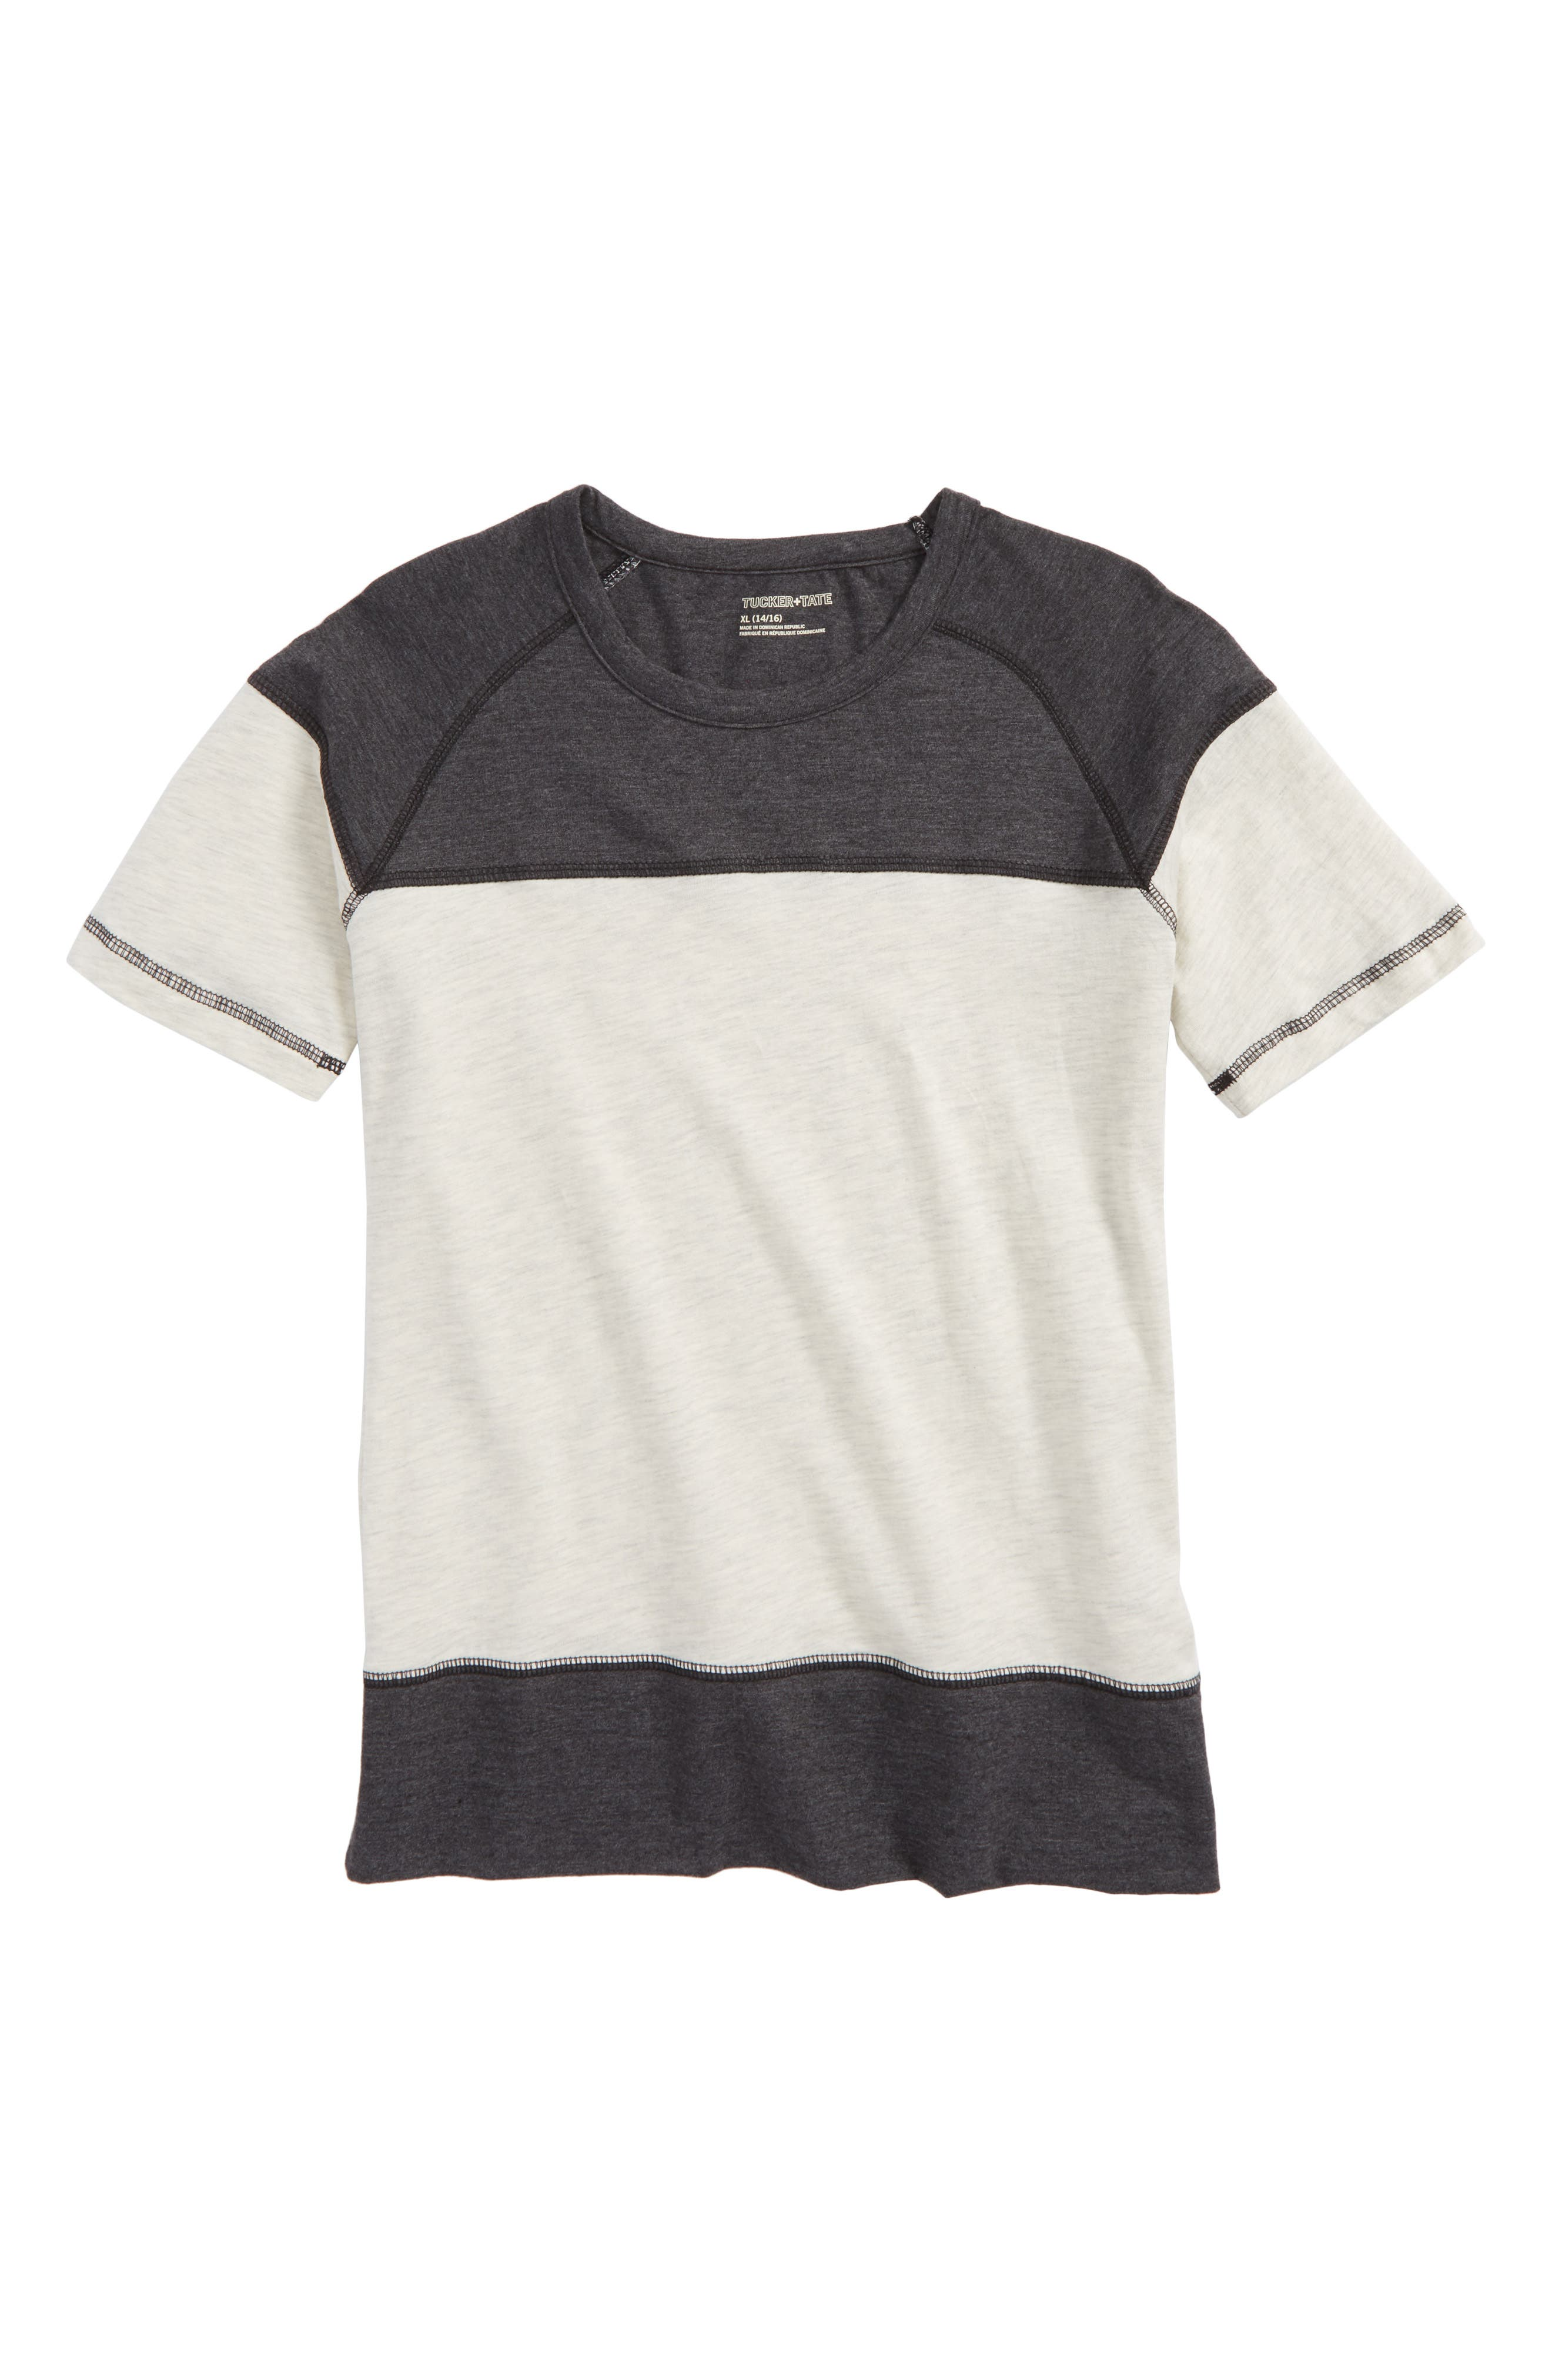 Colorblock T-Shirt,                         Main,                         color, Grey Medium Heather- Black